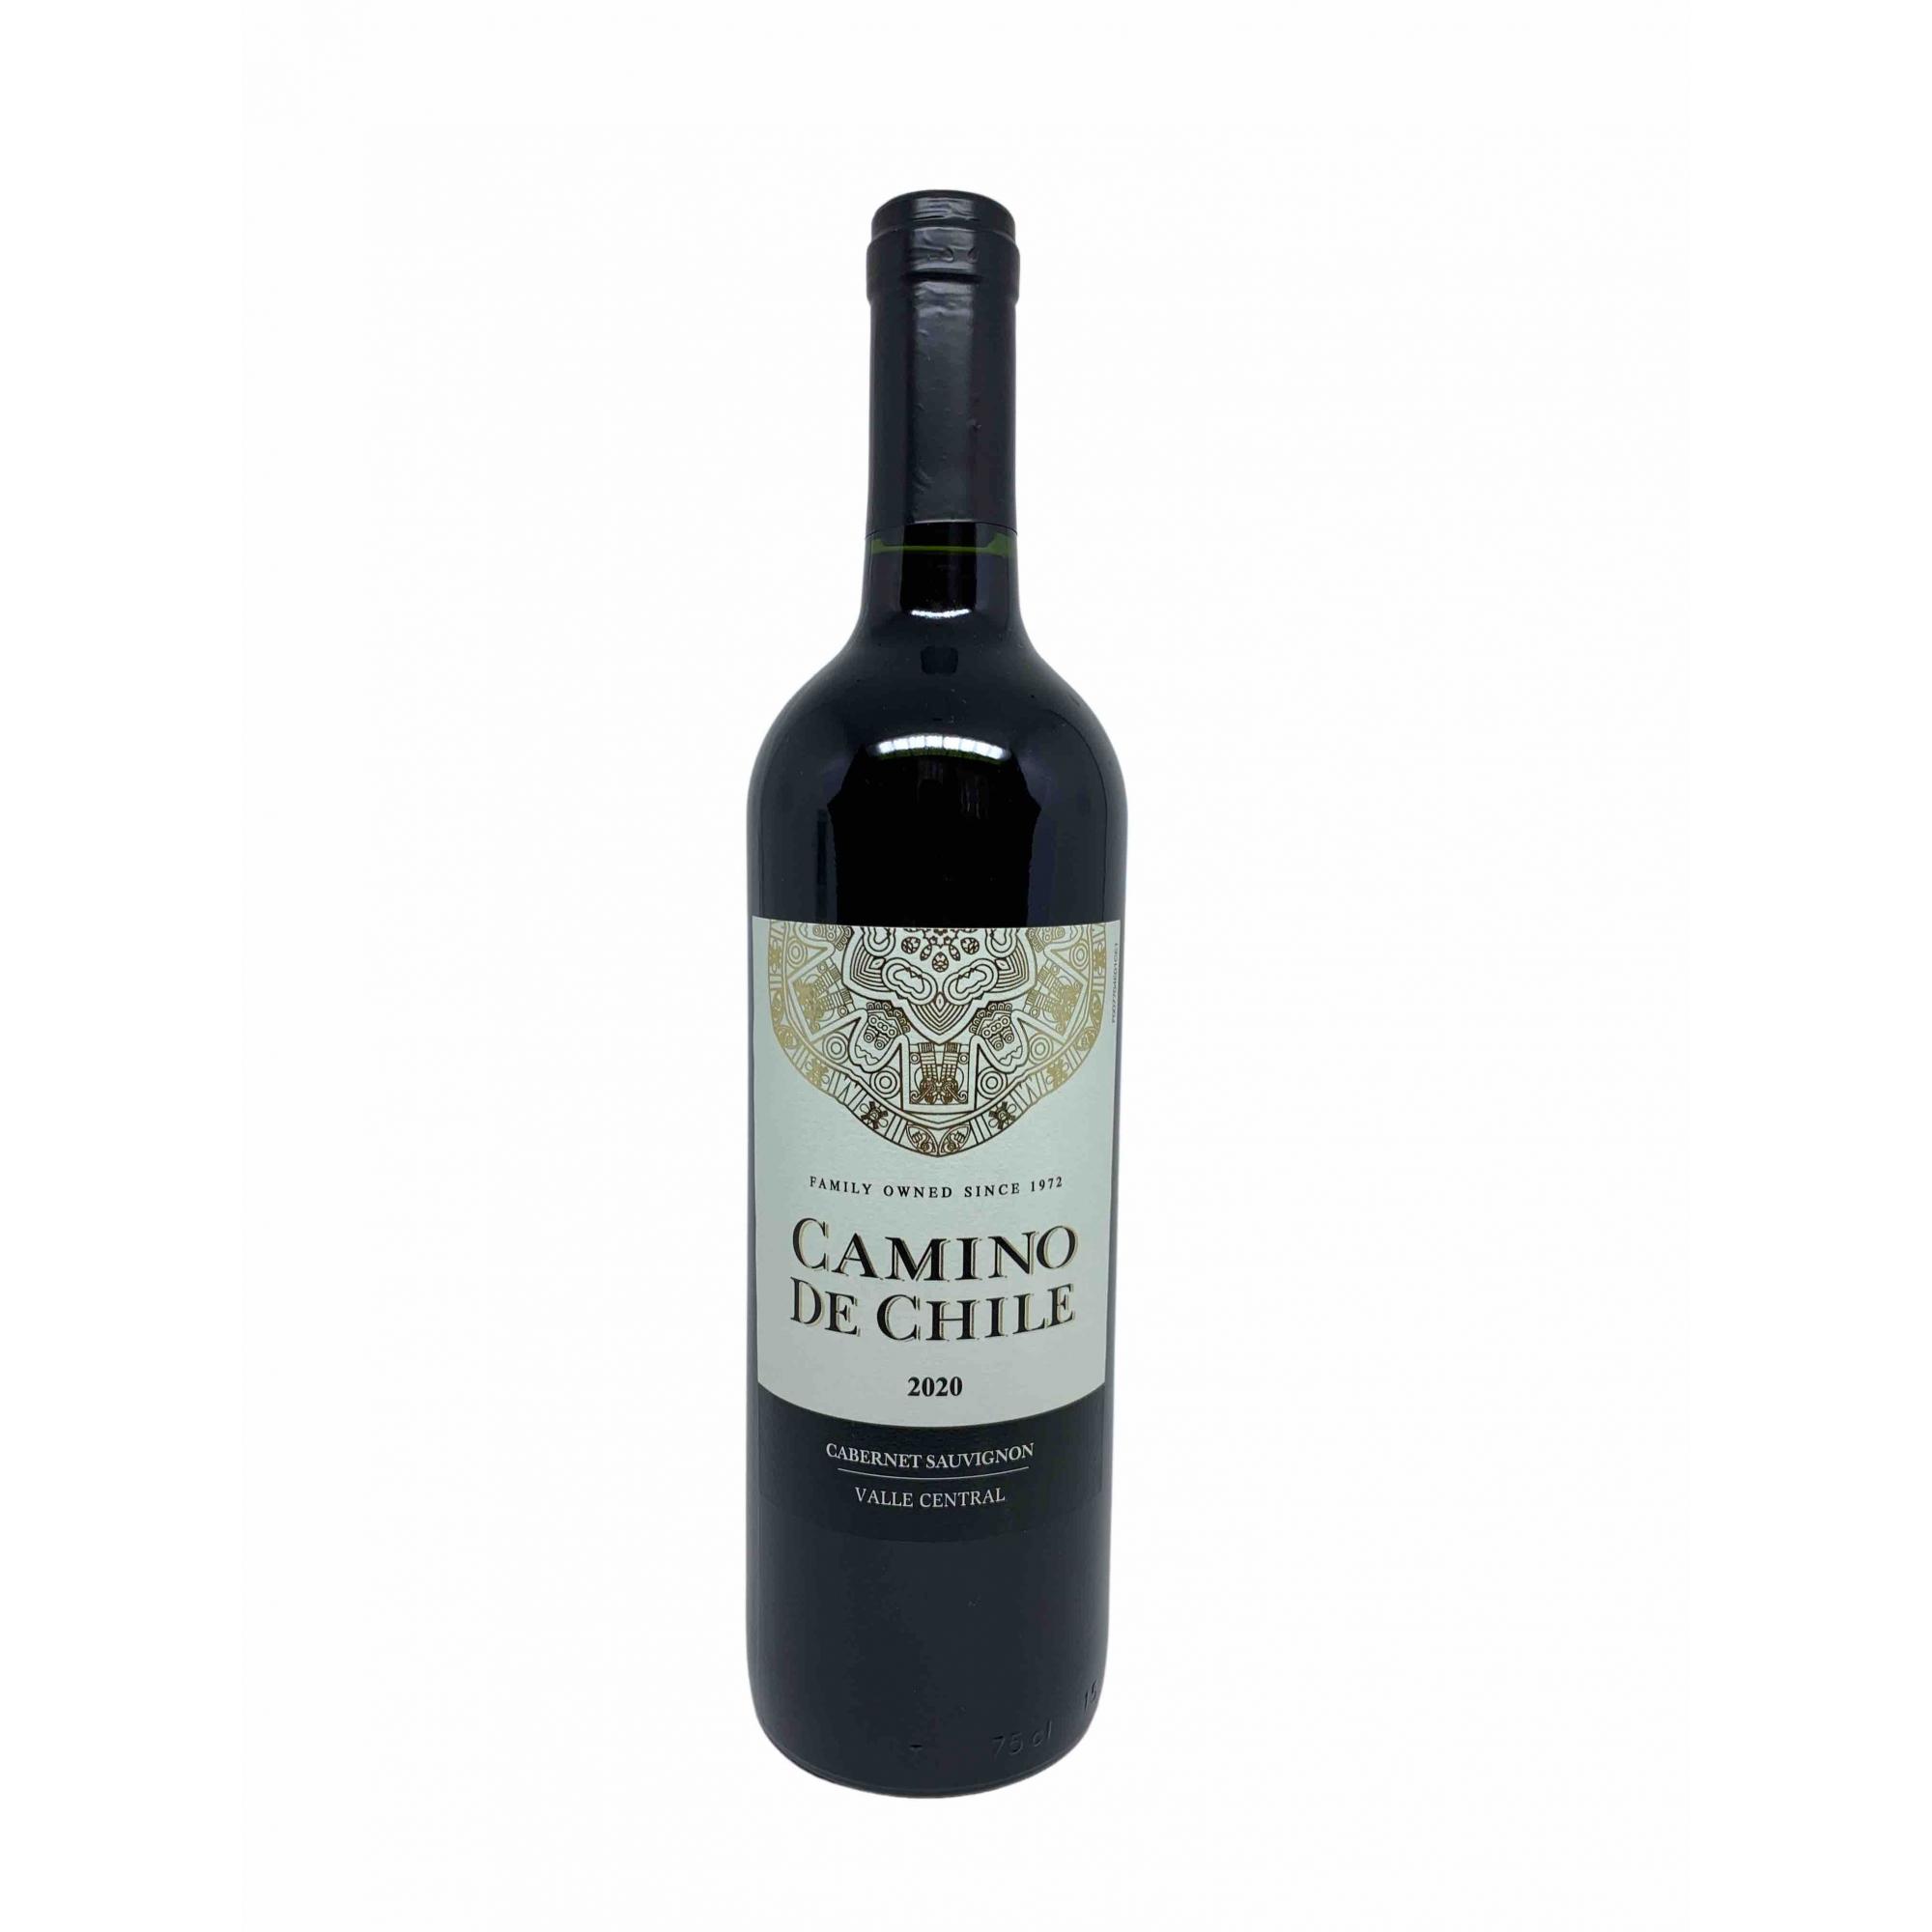 Vinho Tinto Camino de Chile Cabernet Sauvignon 750mL  - ADEGA FARRET